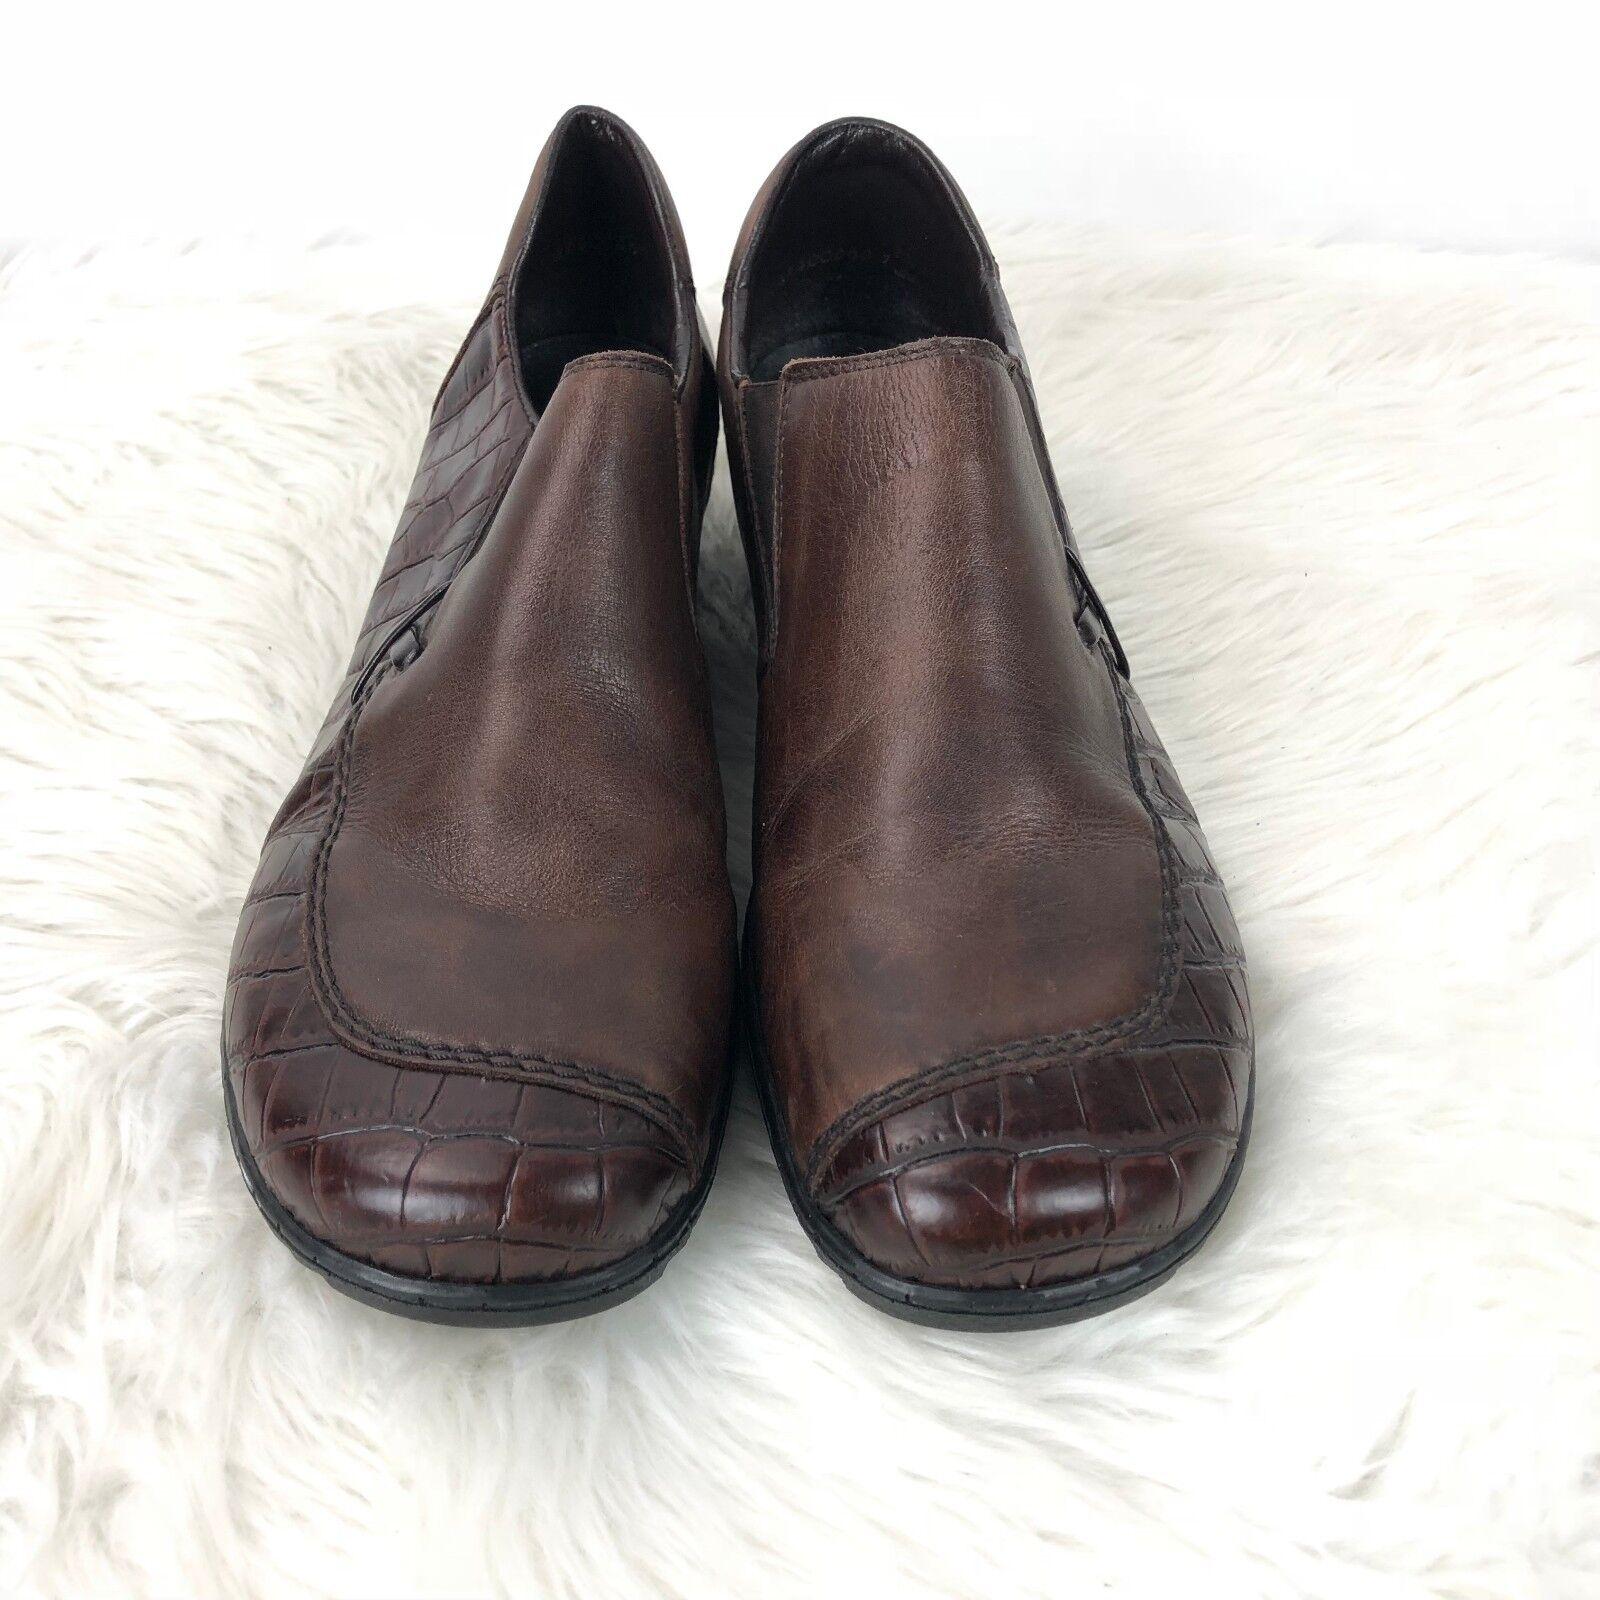 Rieker Antistress 42 damen Printed braun Leather Printed damen Slip-on Comfort schuhe 786dfb